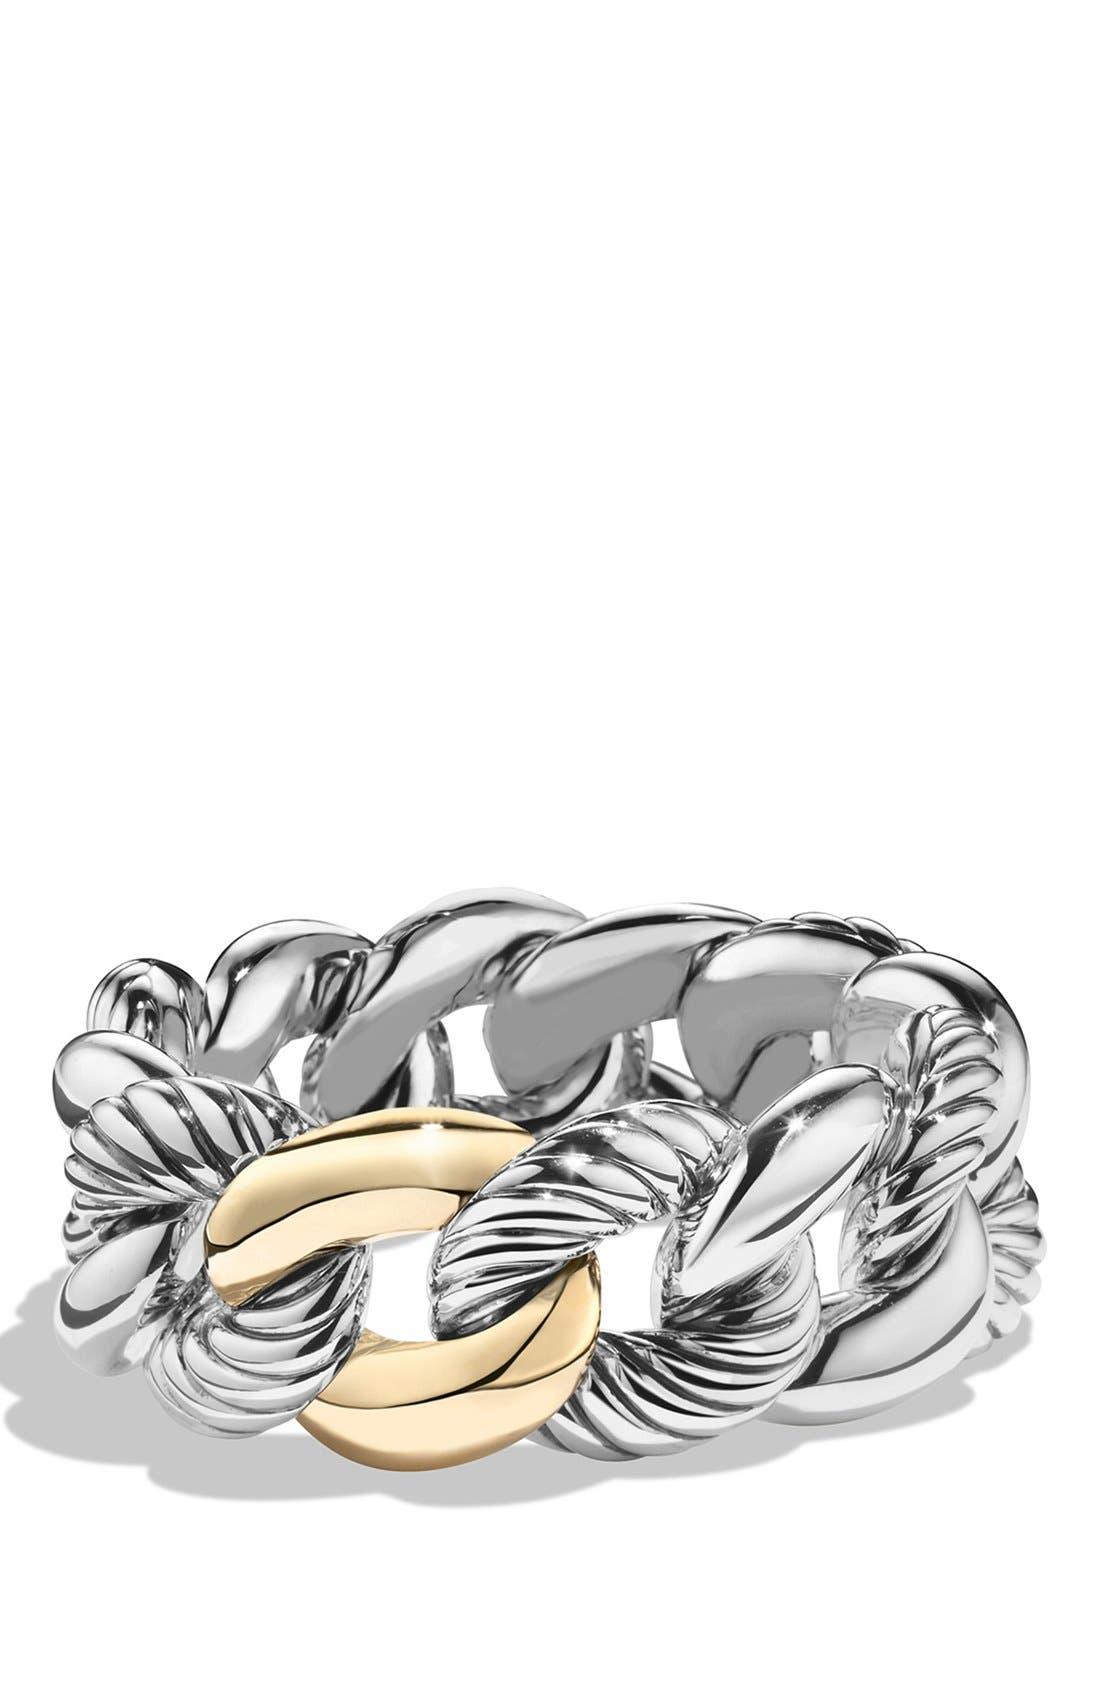 david yurman curb link bracelet with